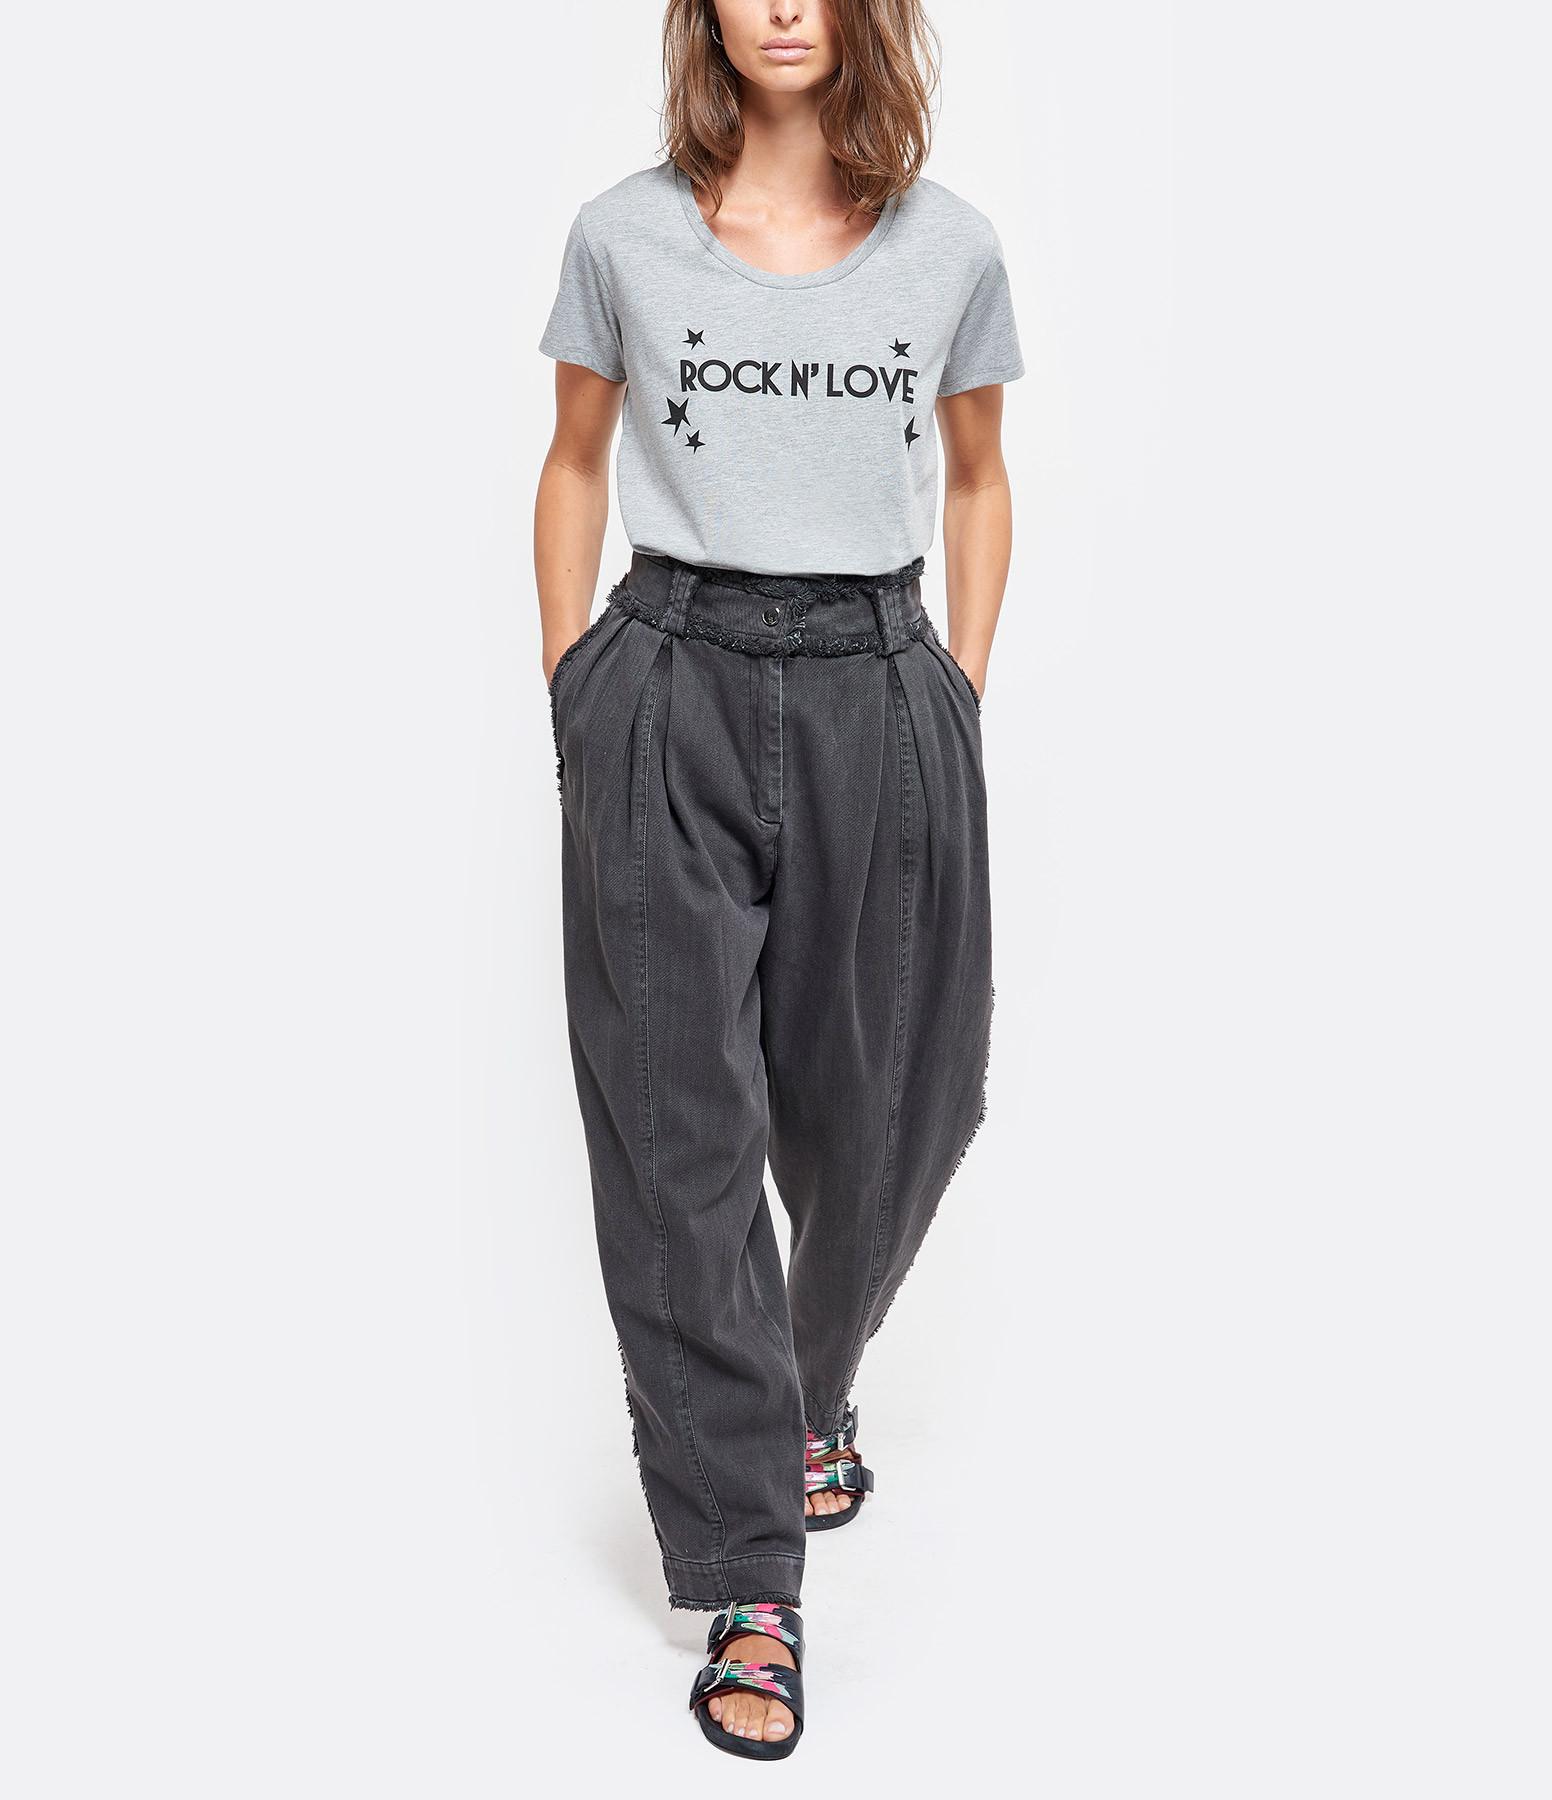 JEANNE VOULAND - Tee-shirt Eder Rock n' Love Coton Gris